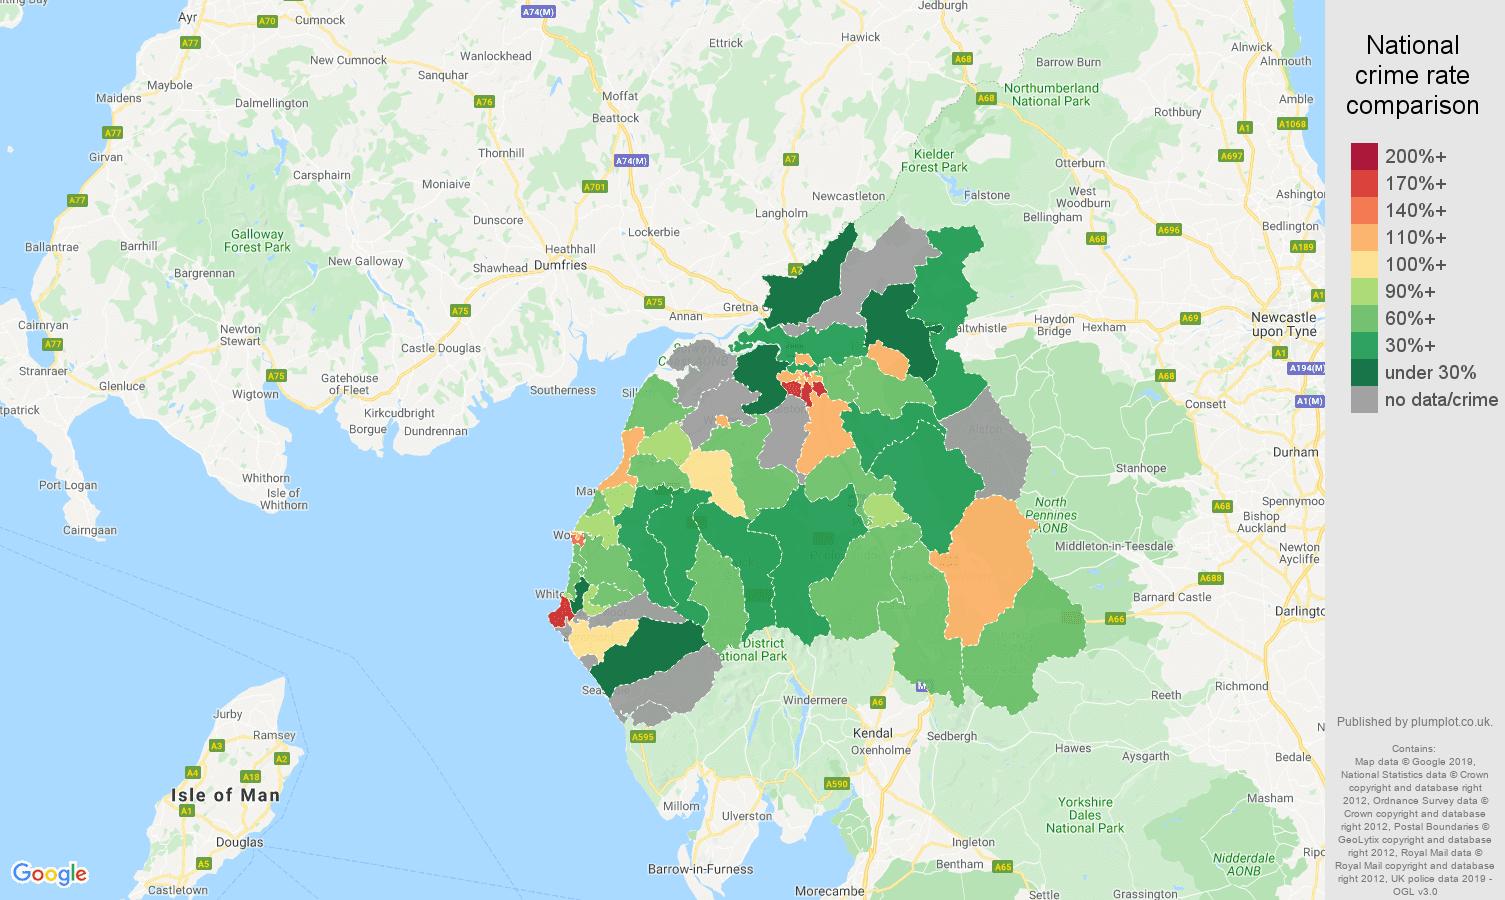 Carlisle other crime rate comparison map